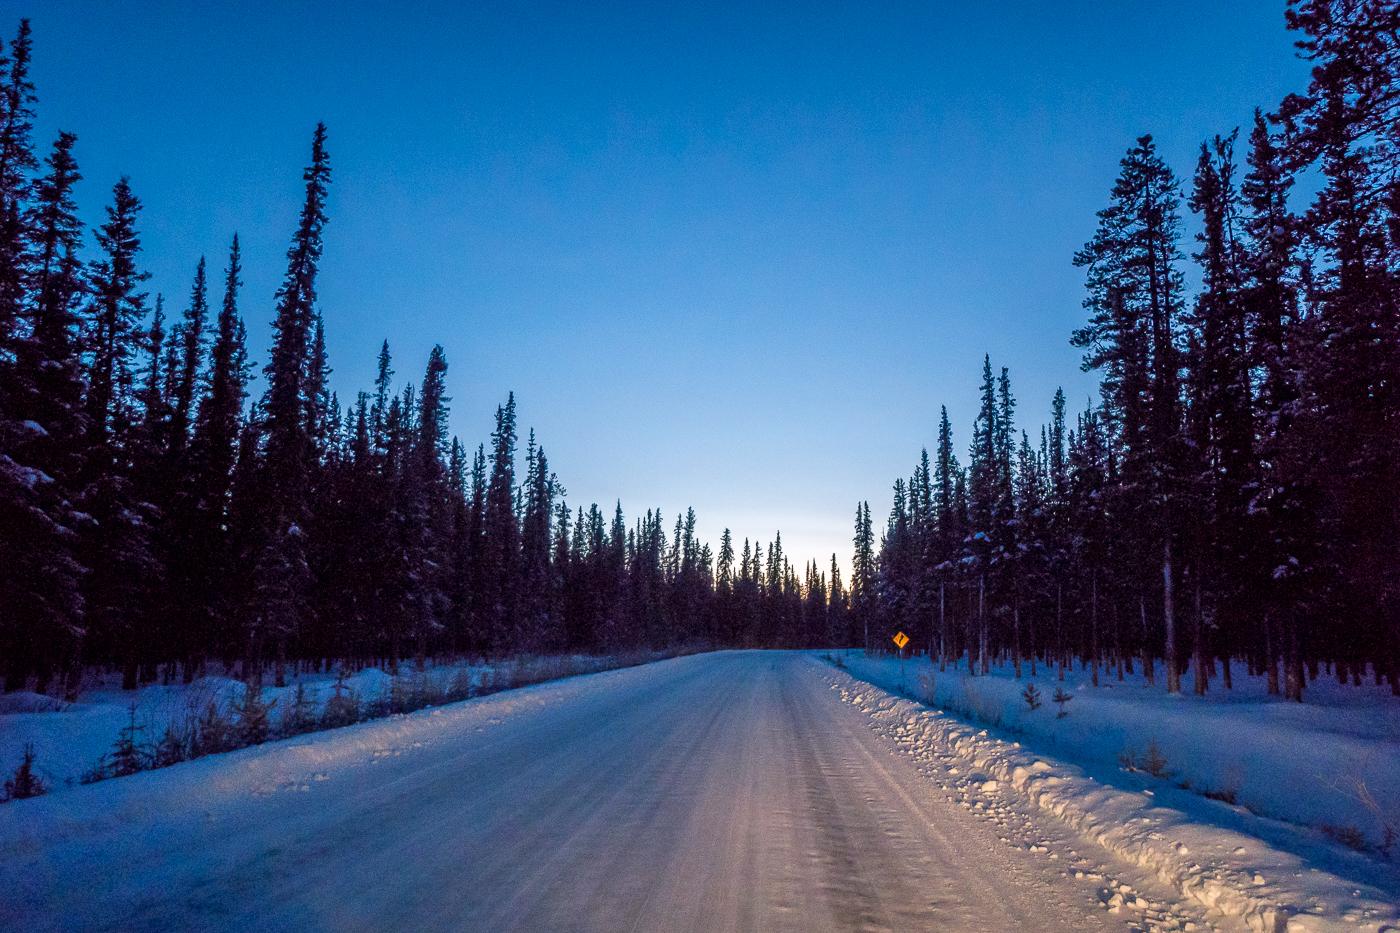 Annie Lake Road de soir près de Whitehorse, Yukon, Canada